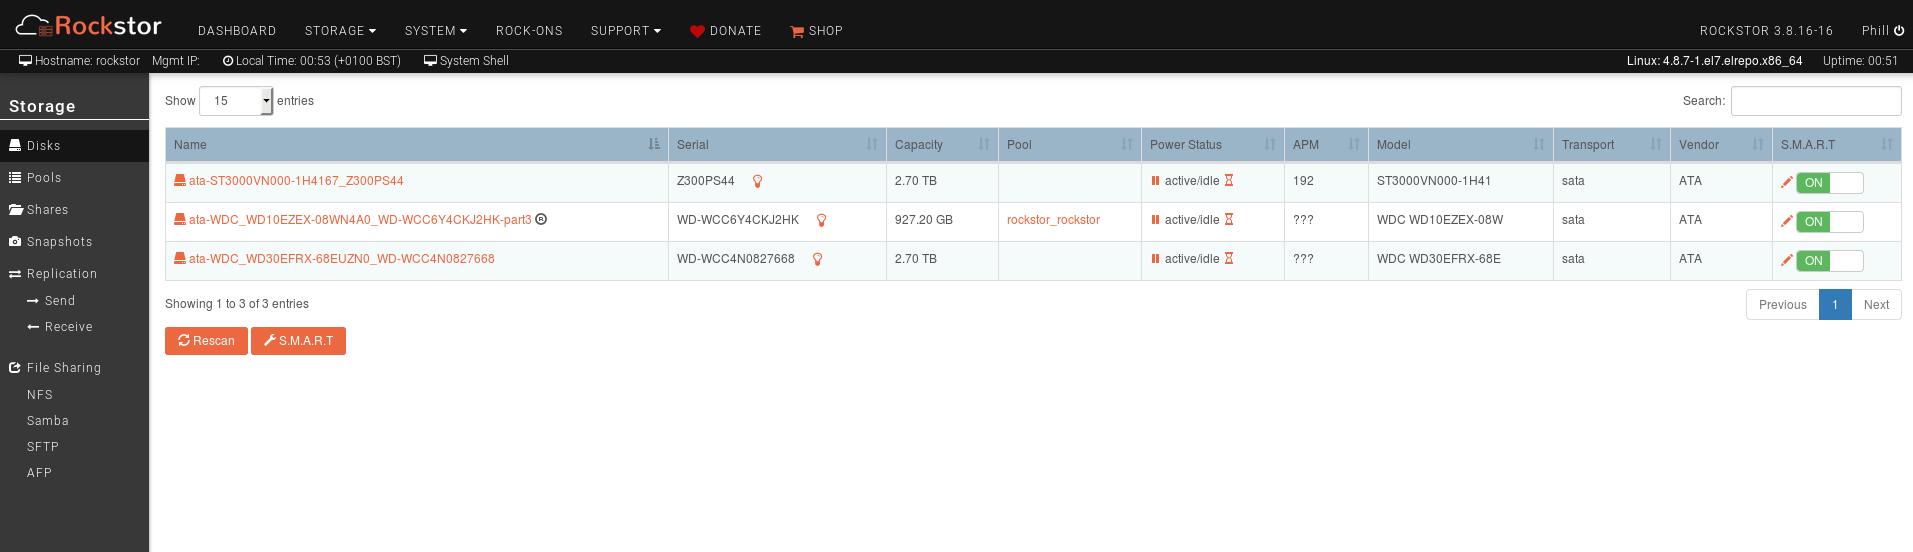 Import BTRFS from OMV - no option to import - Installation